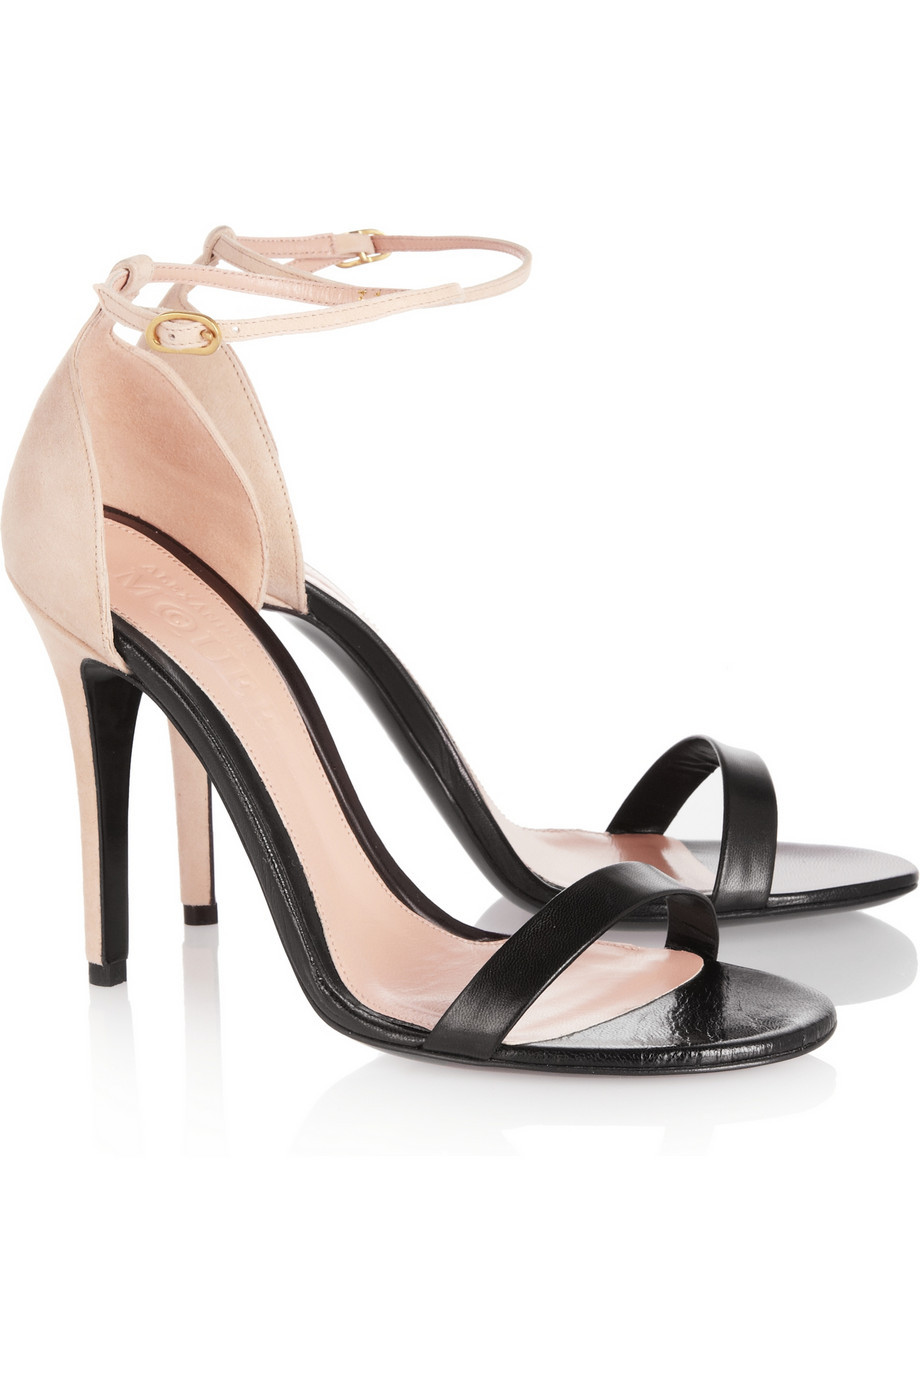 Black Strappy Sandals: Strappy Black